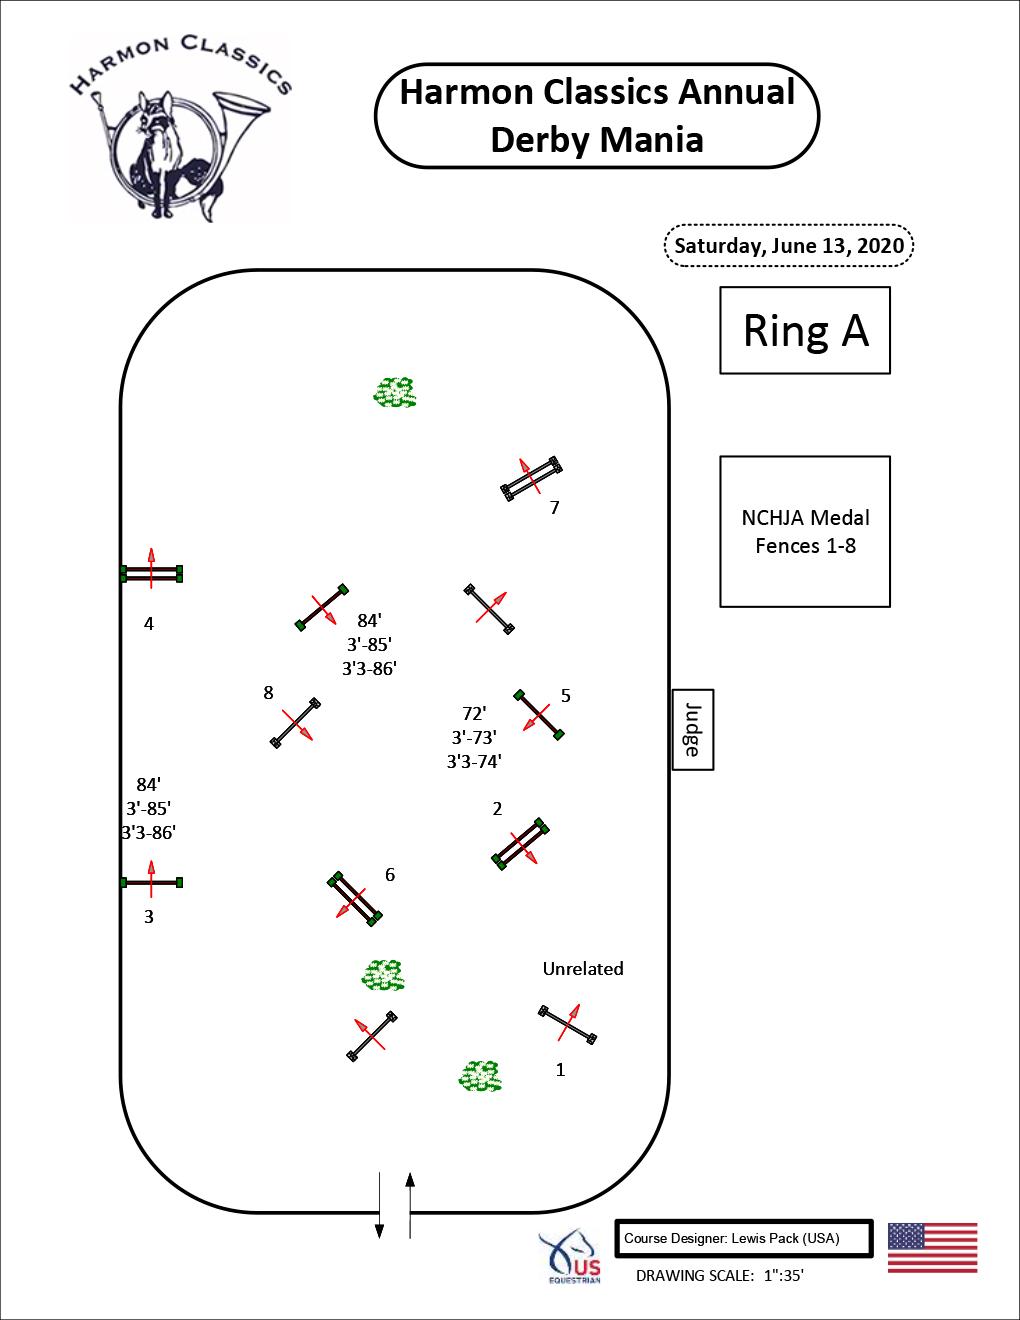 Ring-A-Saturday6-13-NCHJA-Medal-Harmon-Classics-Derby-Mania